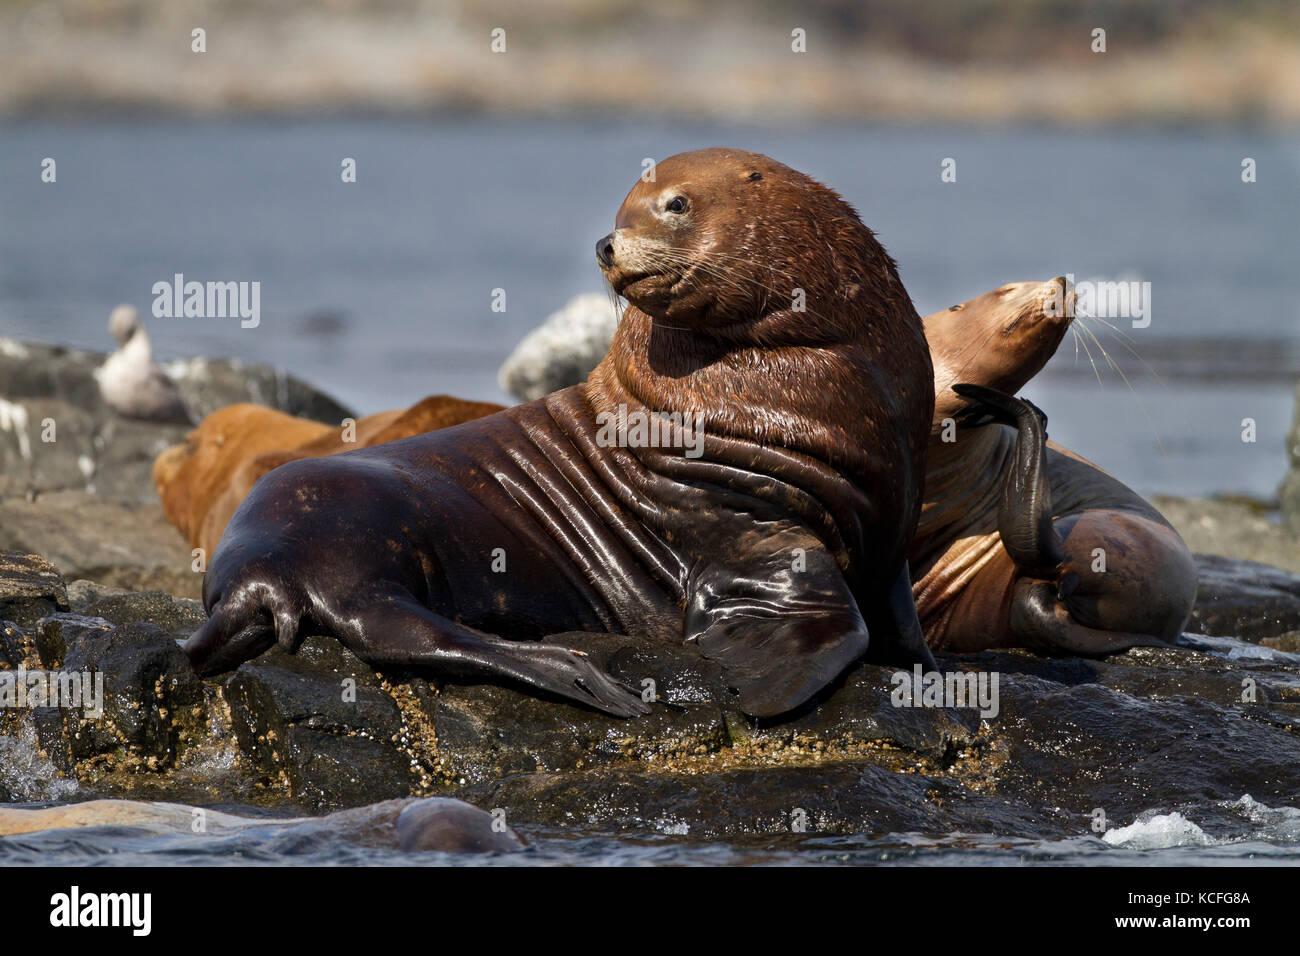 Stellar Sea Lion, Eumetopias jubatus, hauled out at Race Rocks, Near Victoria, British Columbia, Canada - Stock Image